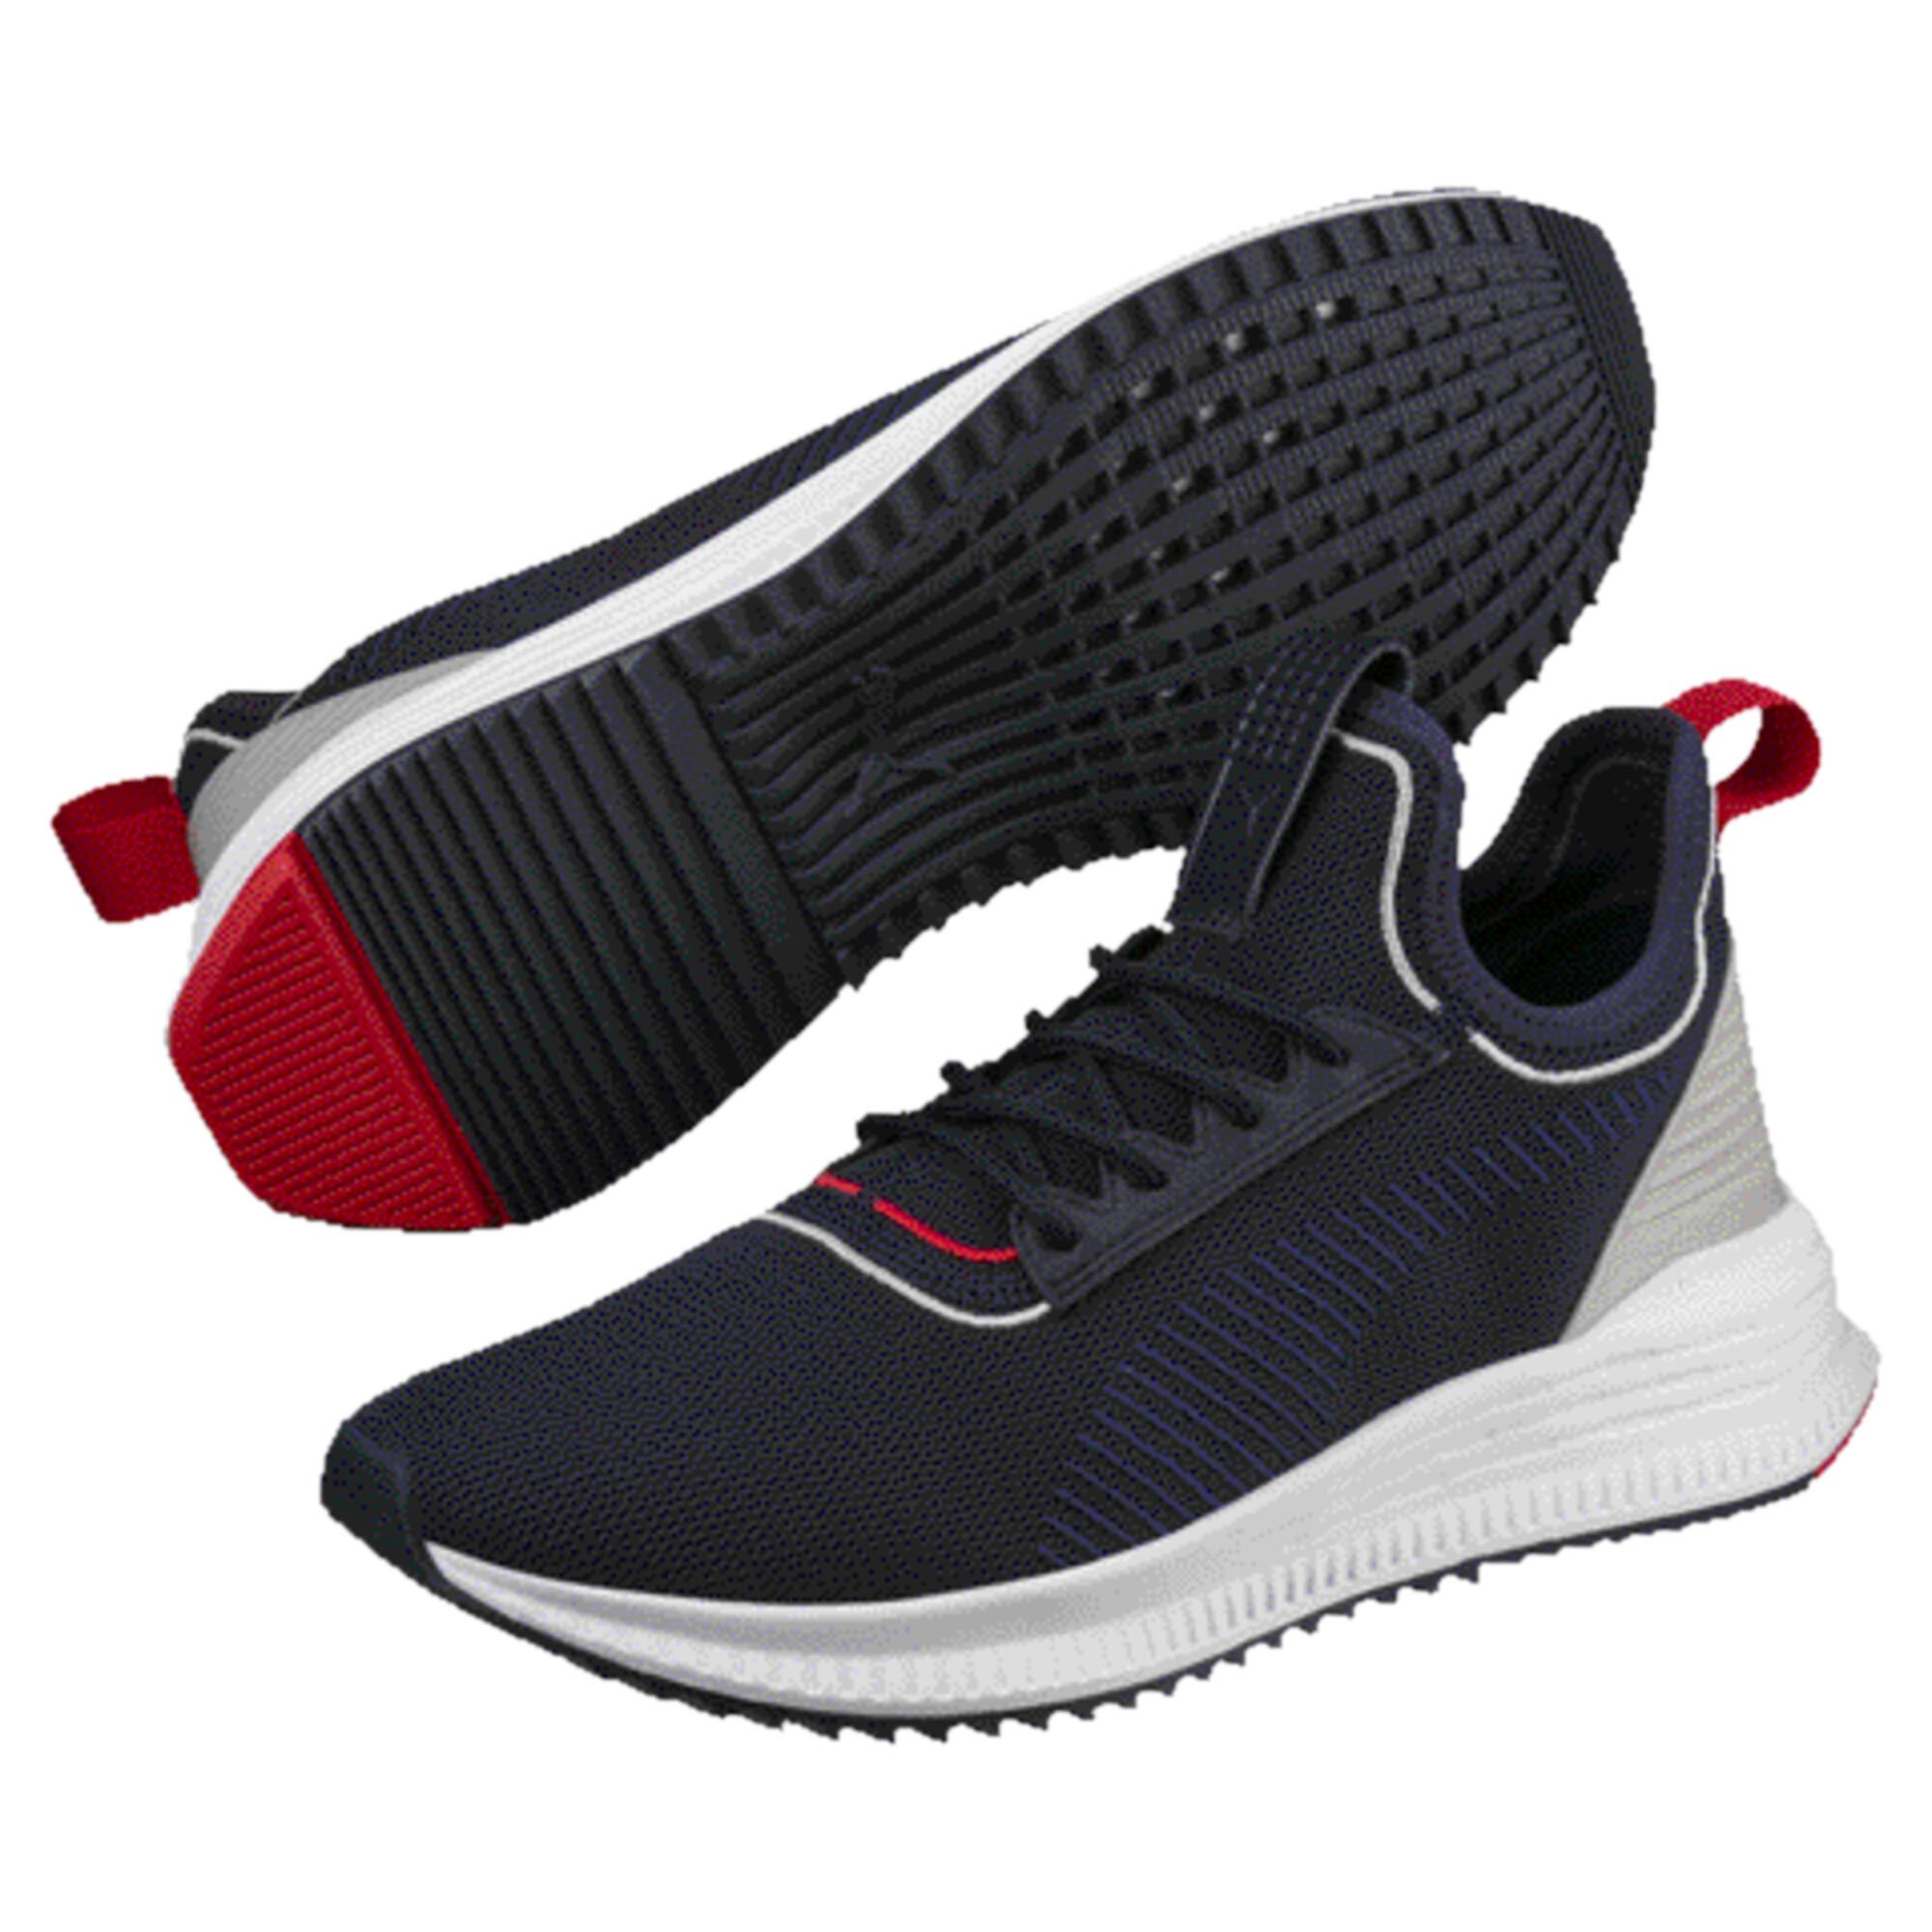 PUMA Avid evoKNIT Sports Stripes Running Shoes Men Shoe ...